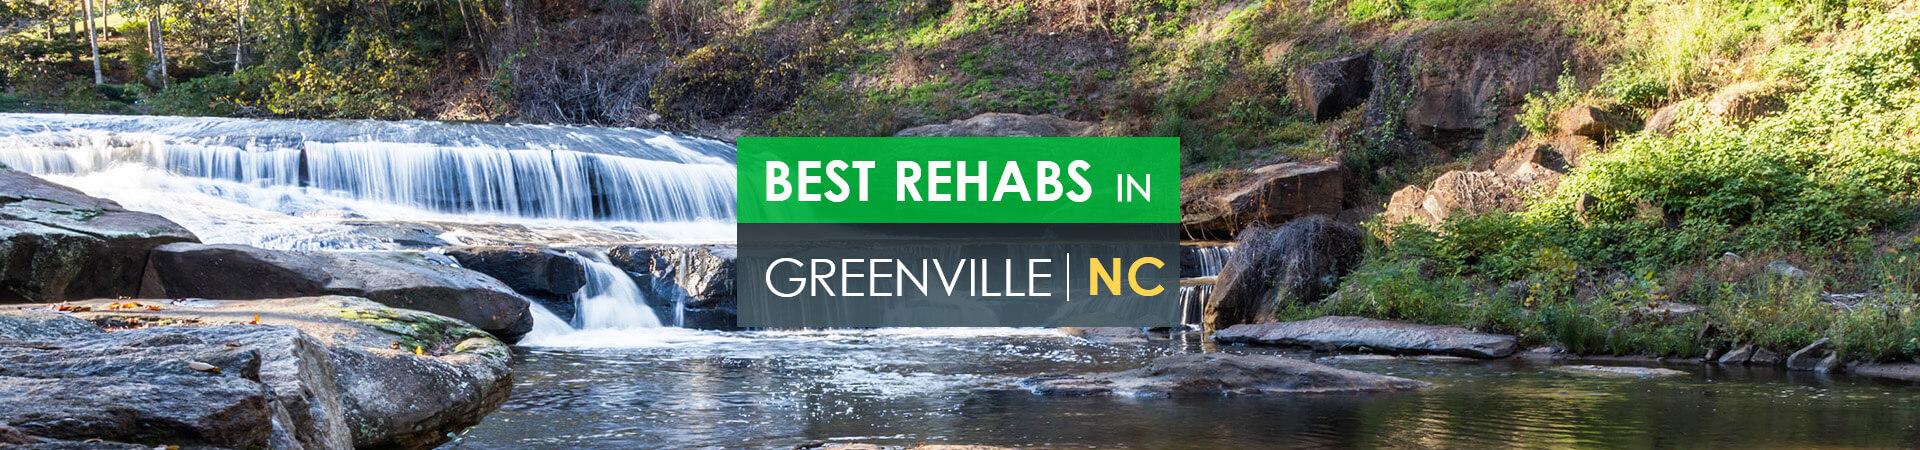 Best rehabs in Greenville, NC